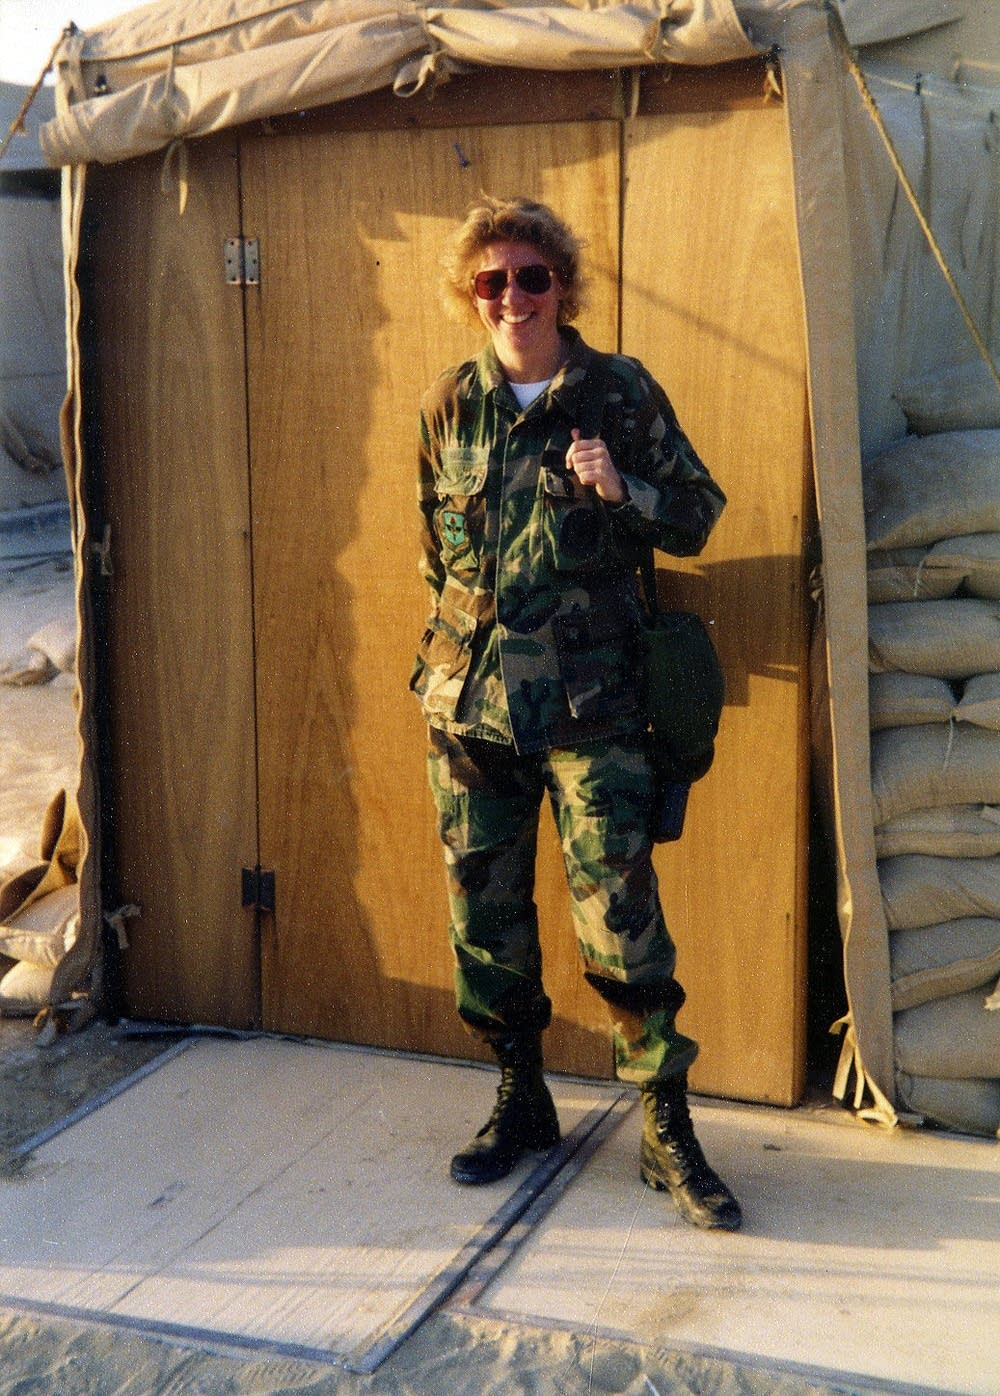 Military veteran Chante Wolf